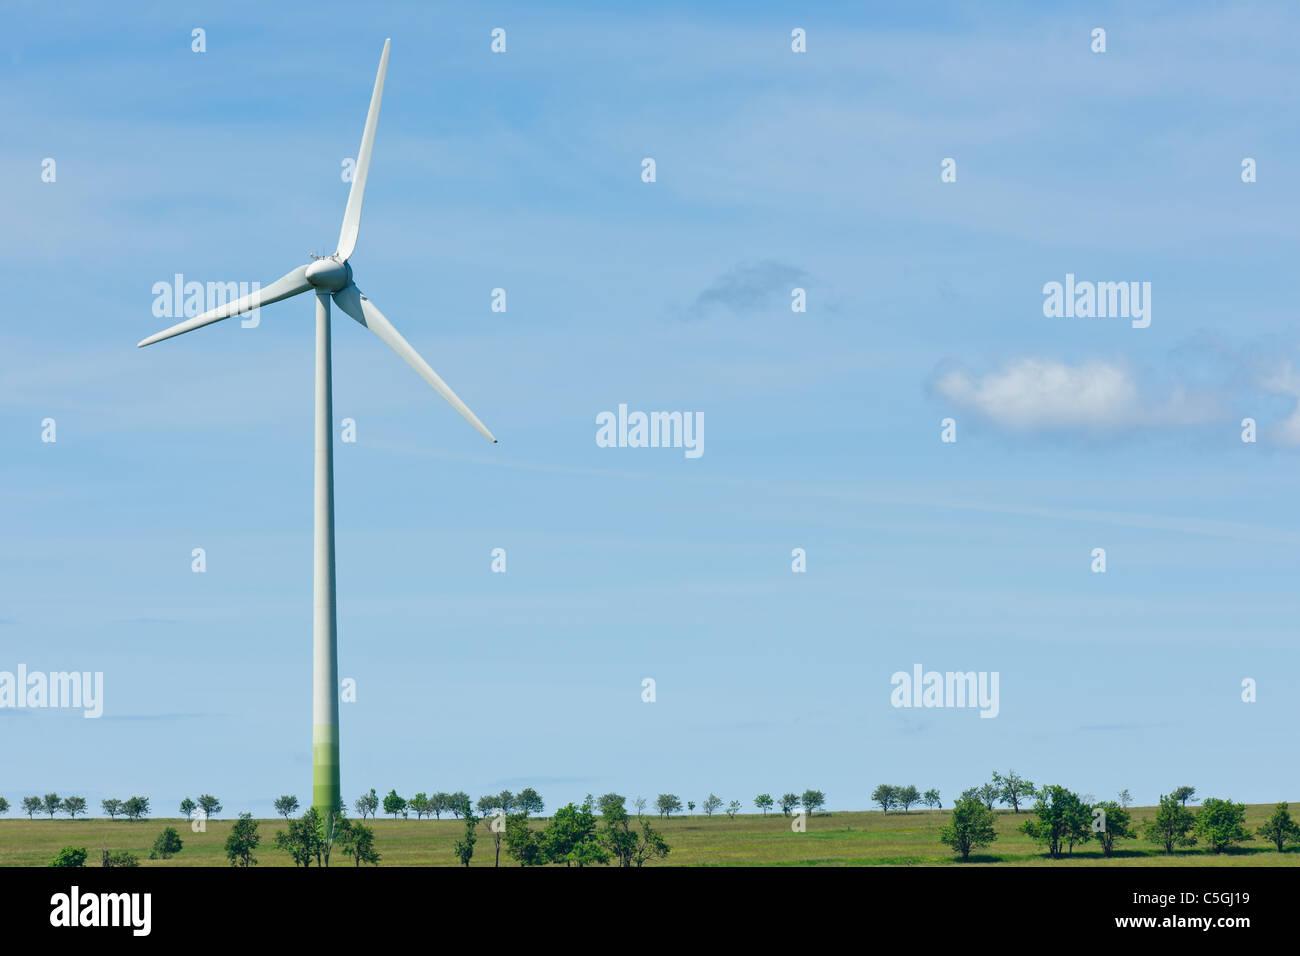 Ökostrom Windmühle Generatoren Ökologie Landschaft blaue Himmel Stockbild